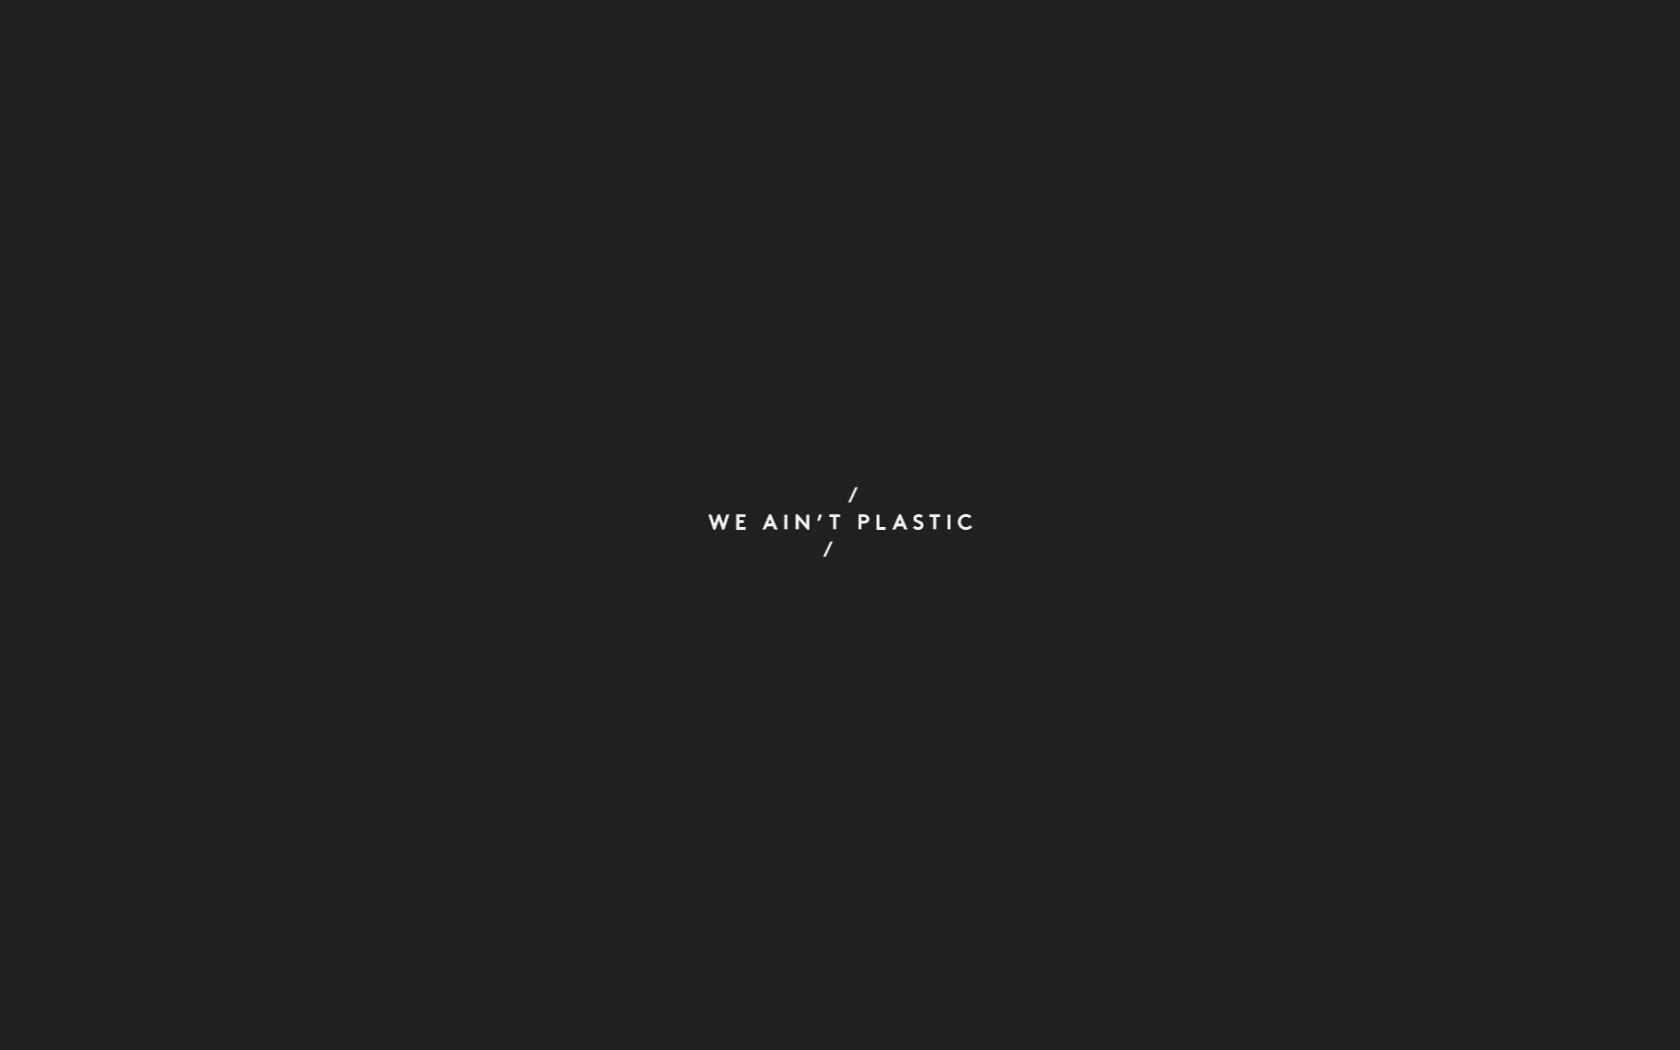 Weaintplastic 01